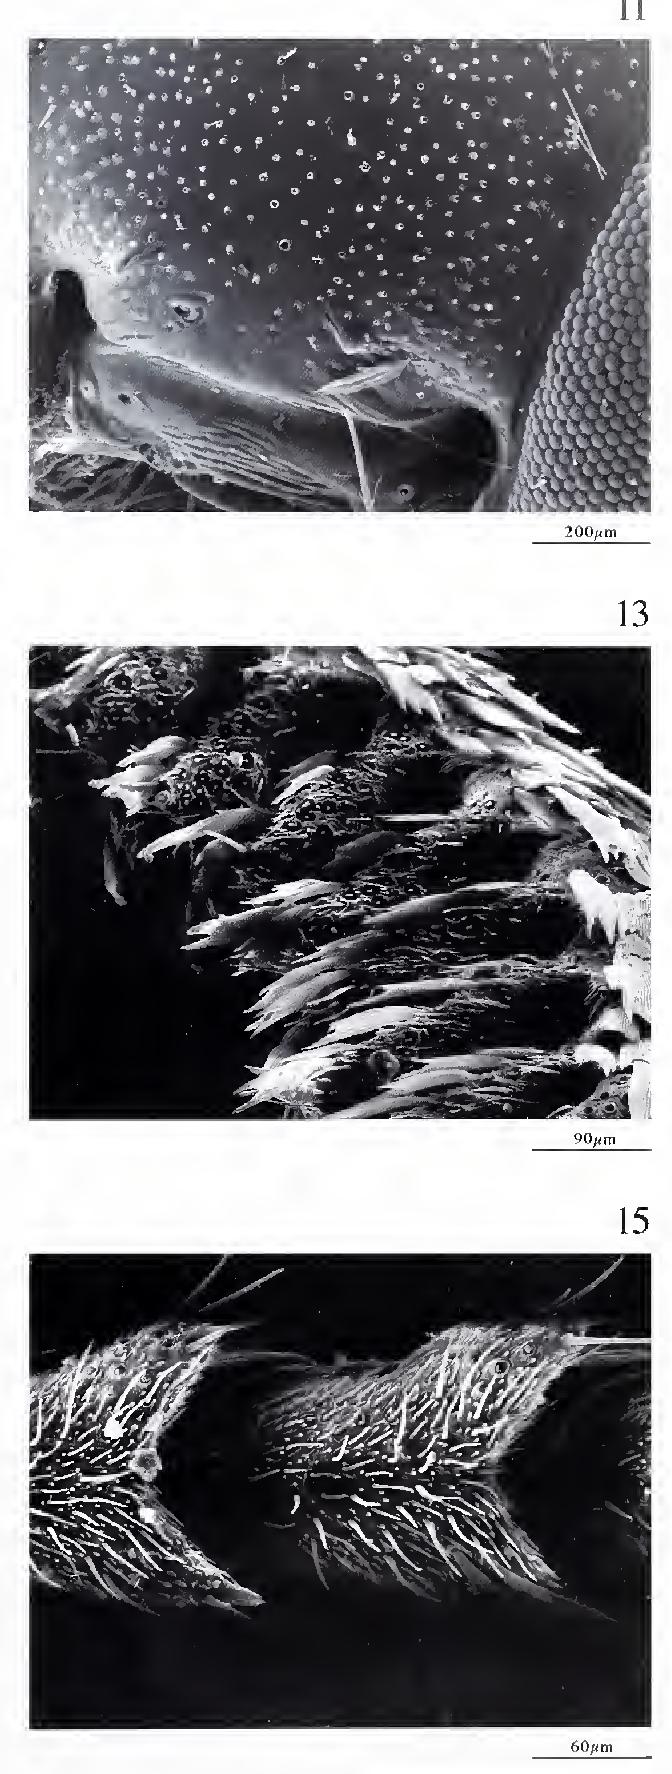 figure 11-15